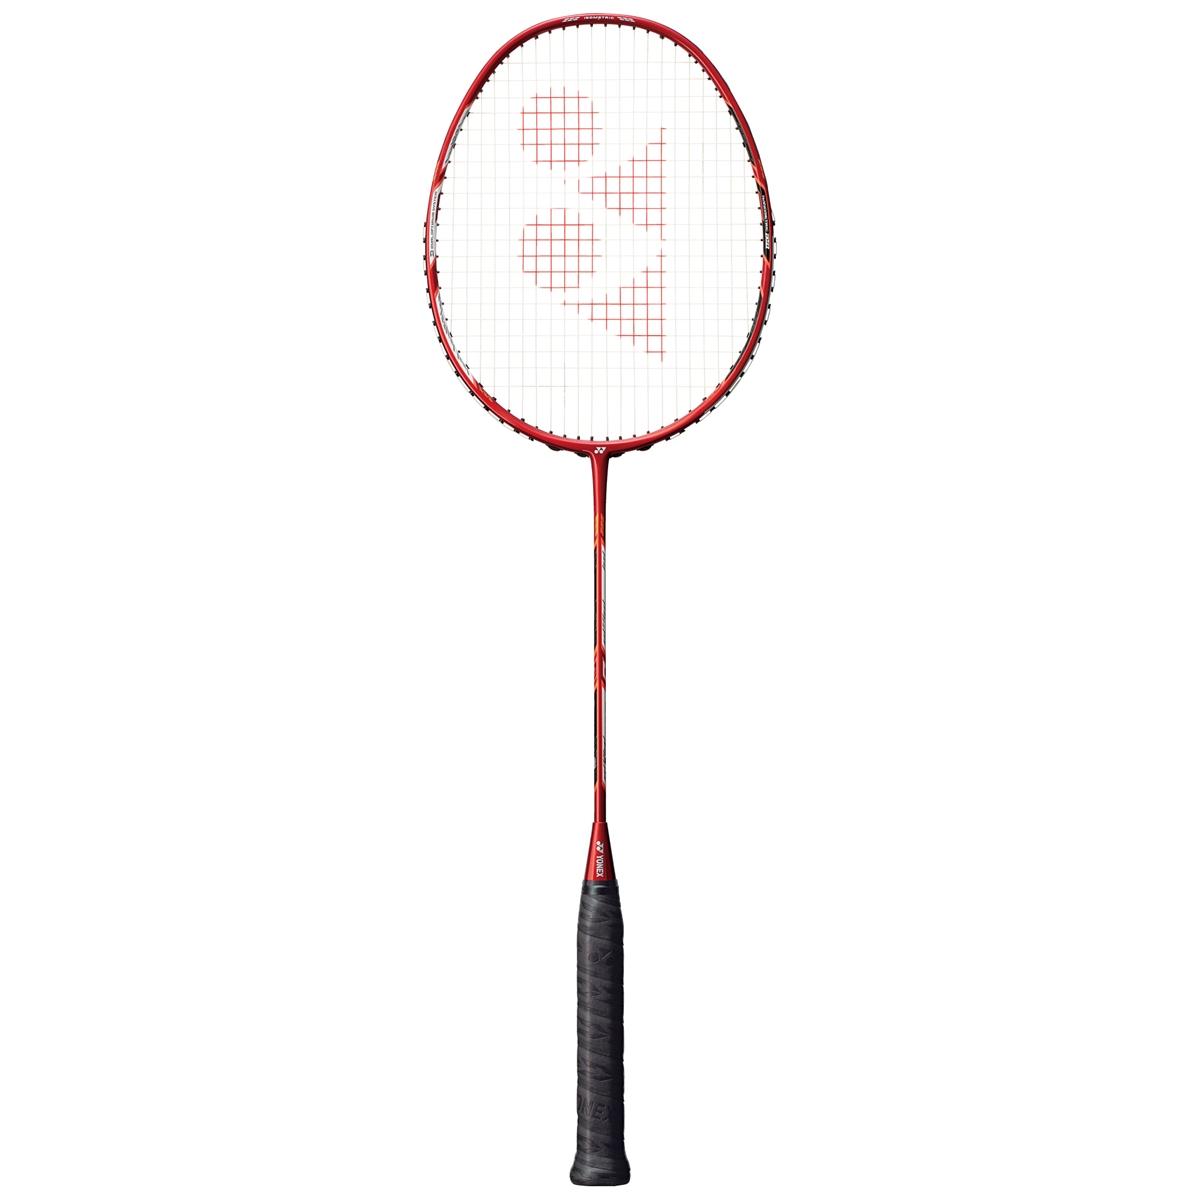 Yonex duo RA 7 DUORA 7 DUO7 badminton Racquet YONEX 2016 spring free in summer model we specify the gut stringing